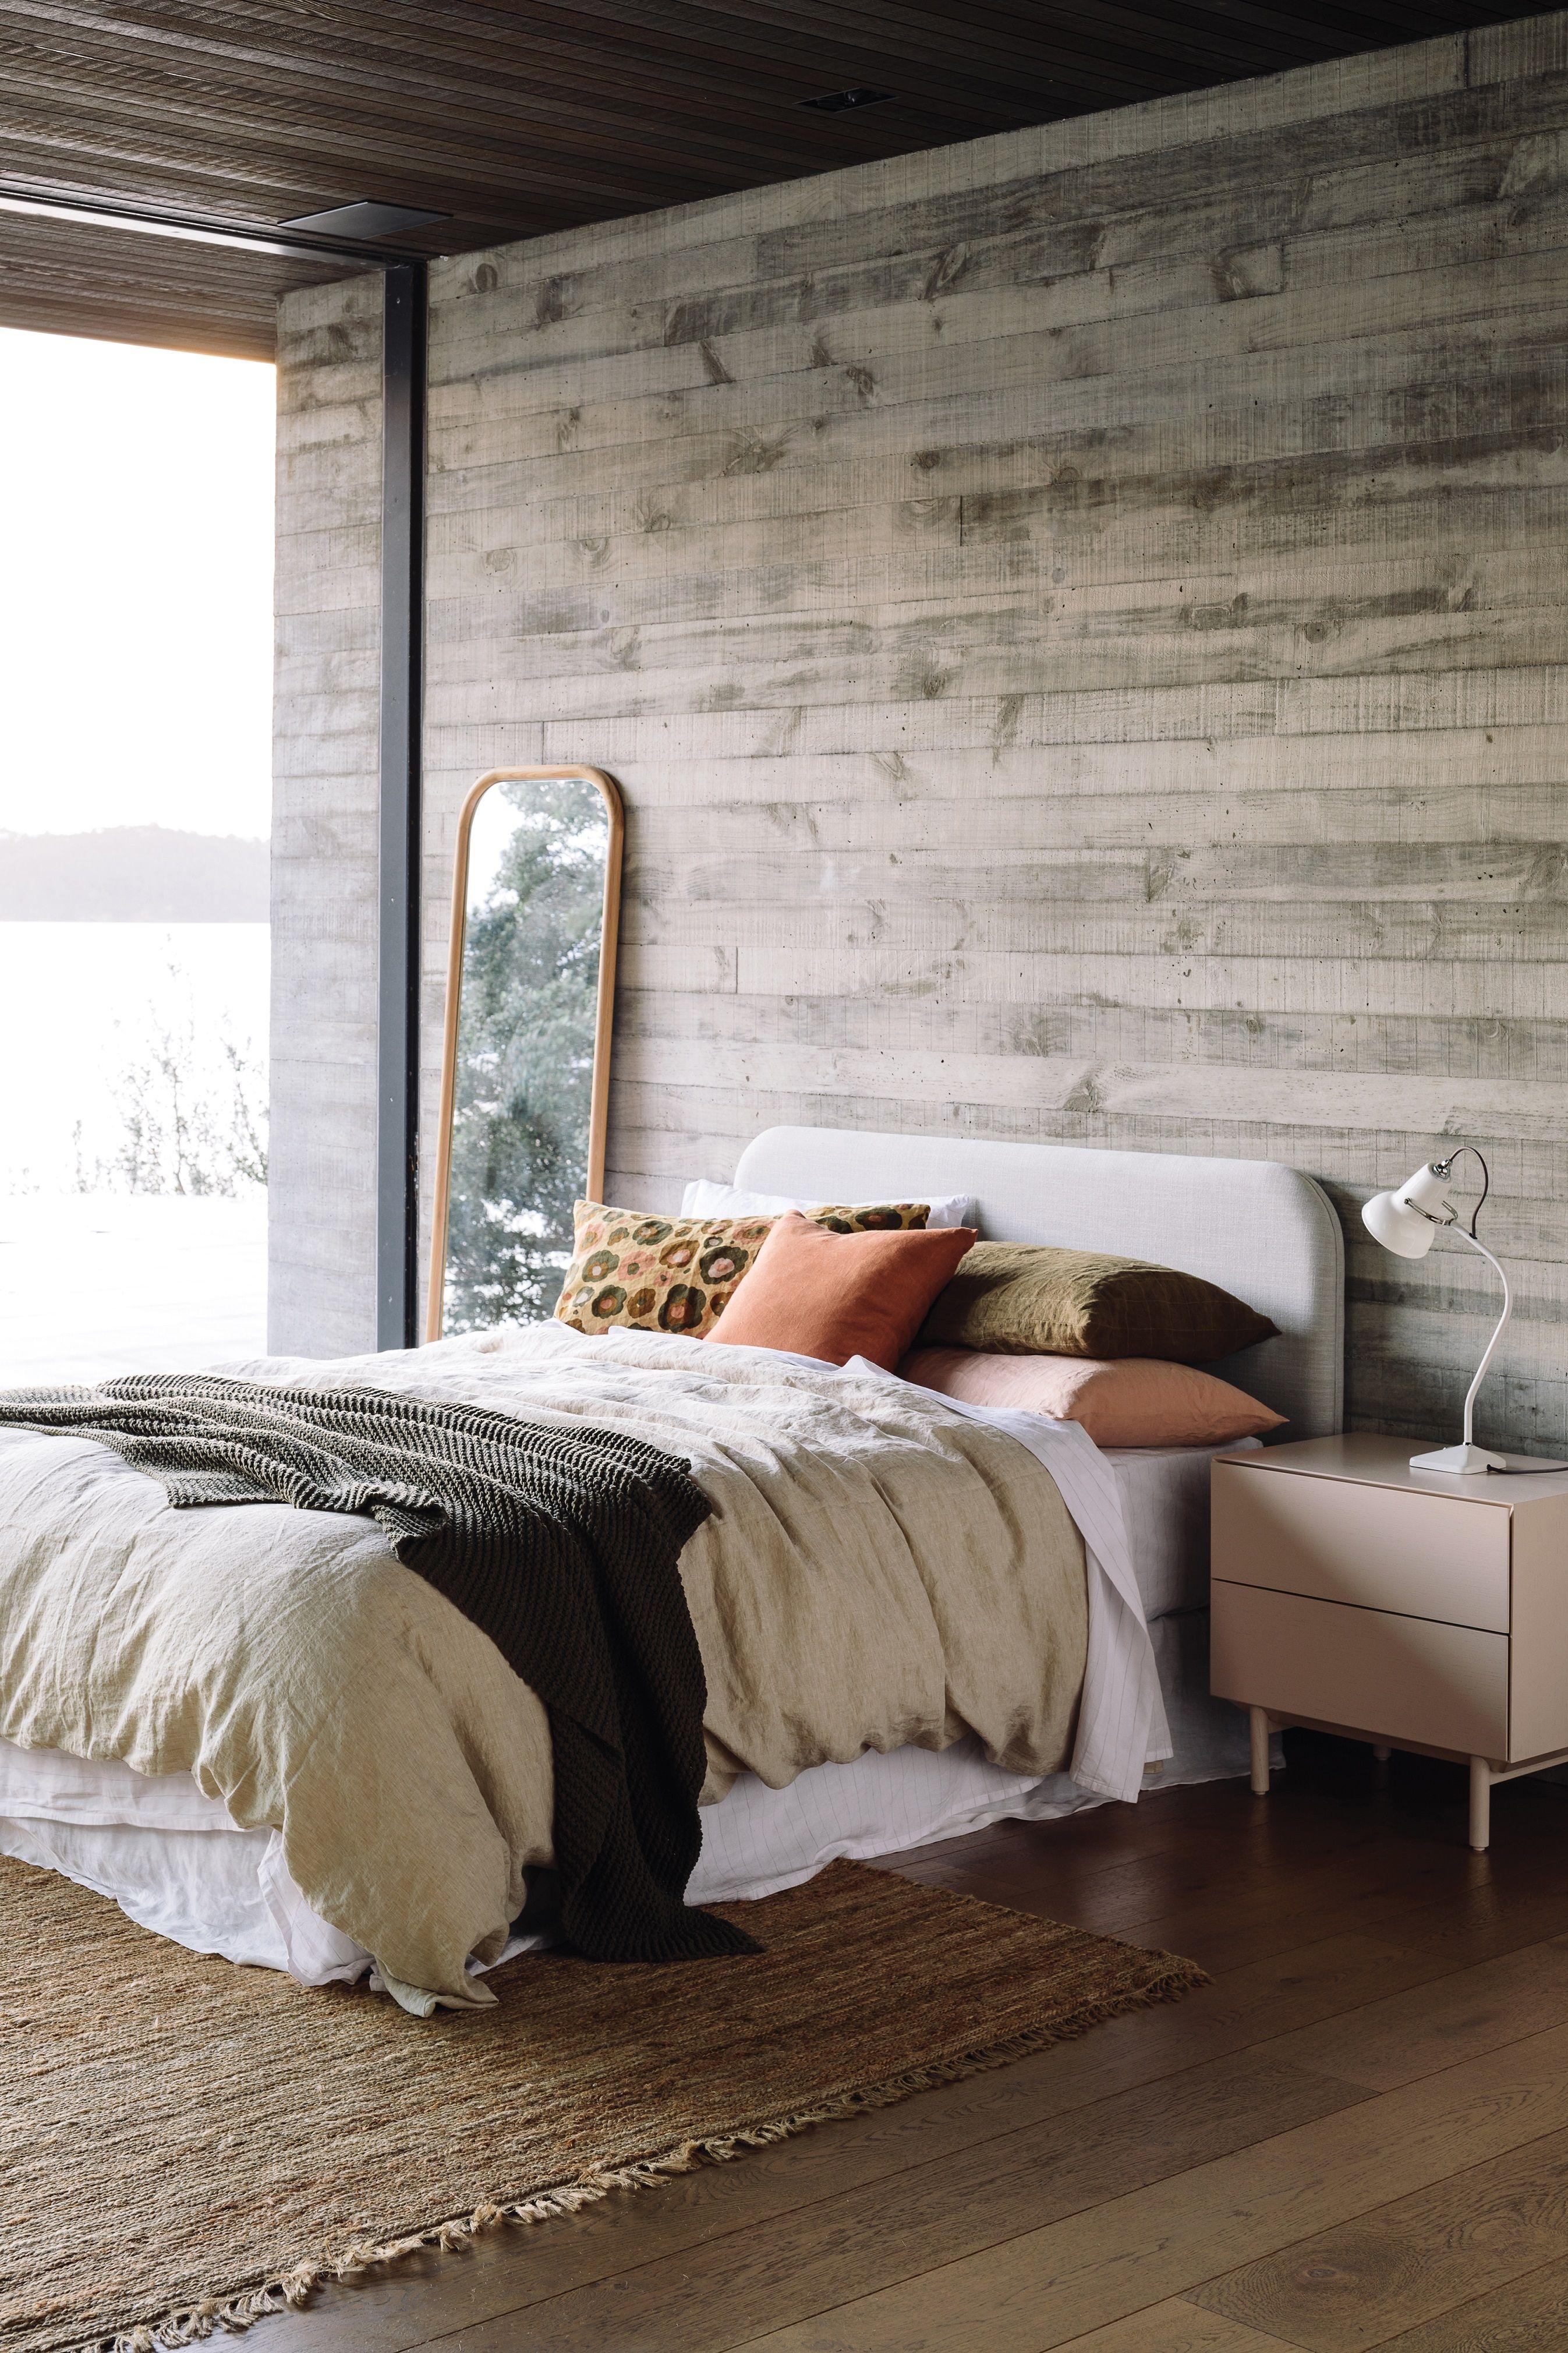 Citta Arcadia Spring/Summer Collection 2018 Bed linen